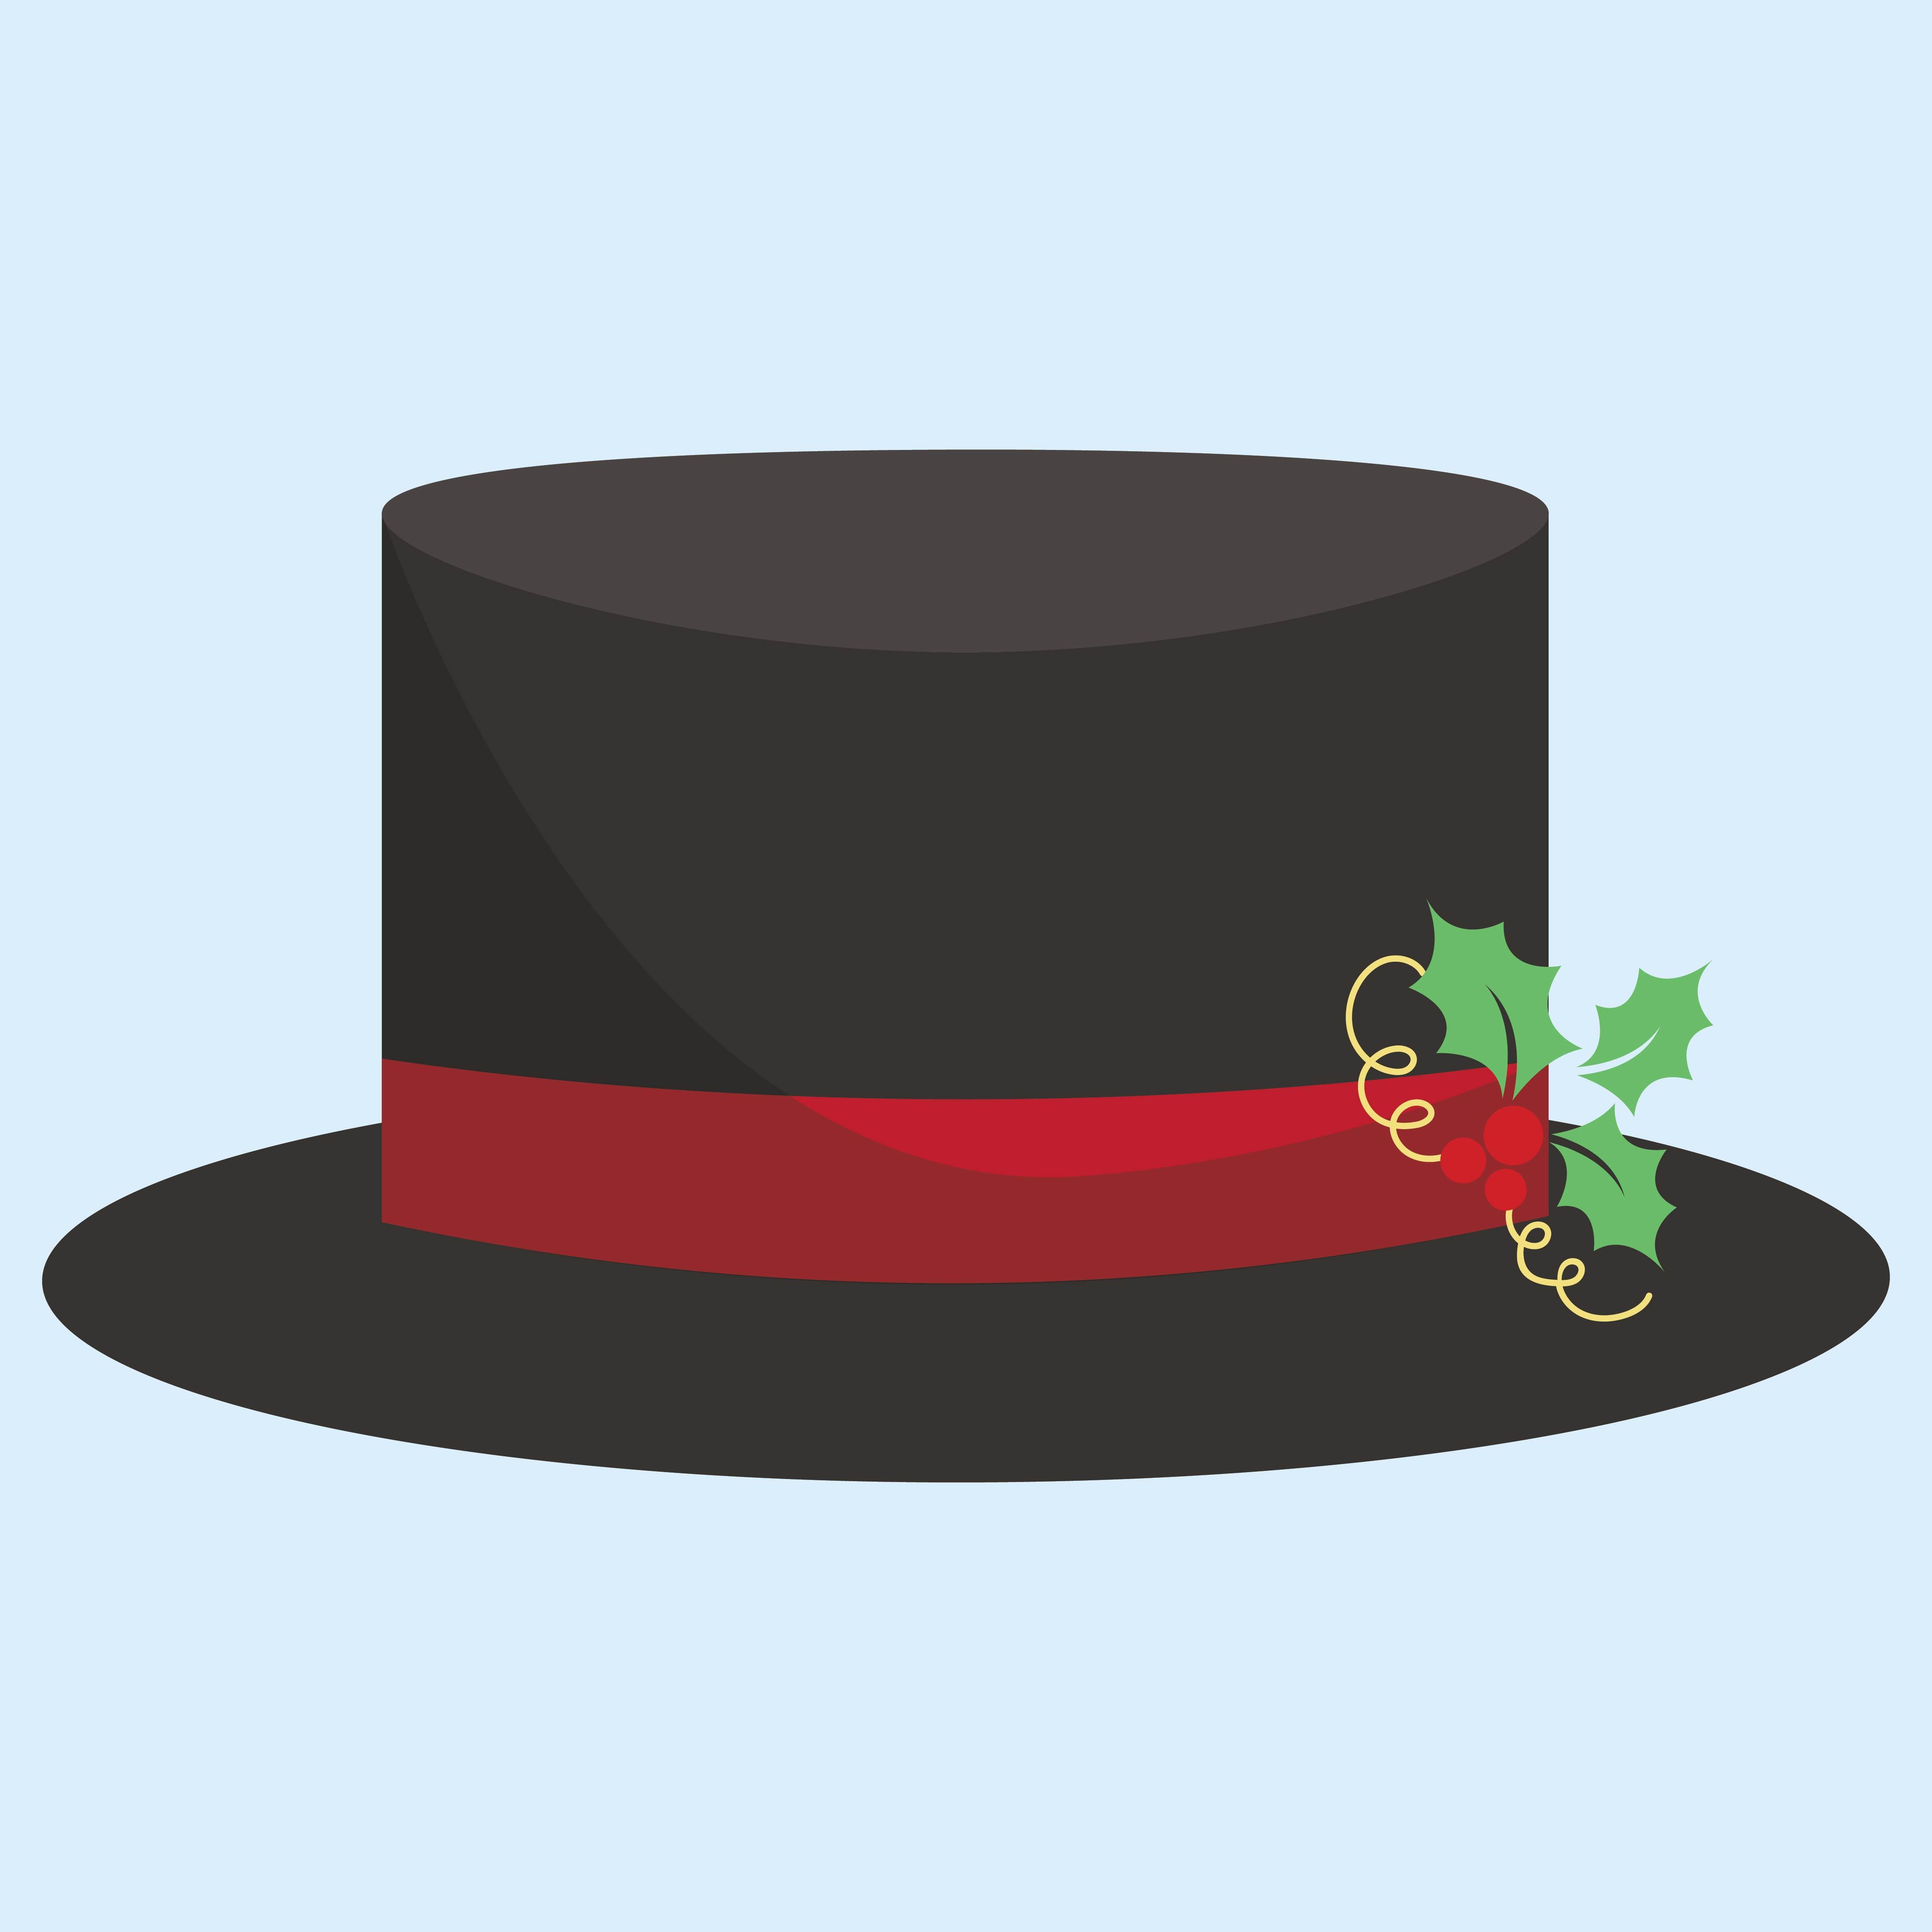 Best Images of Printable Top Hat Snowman - Snowman Top Hat ...